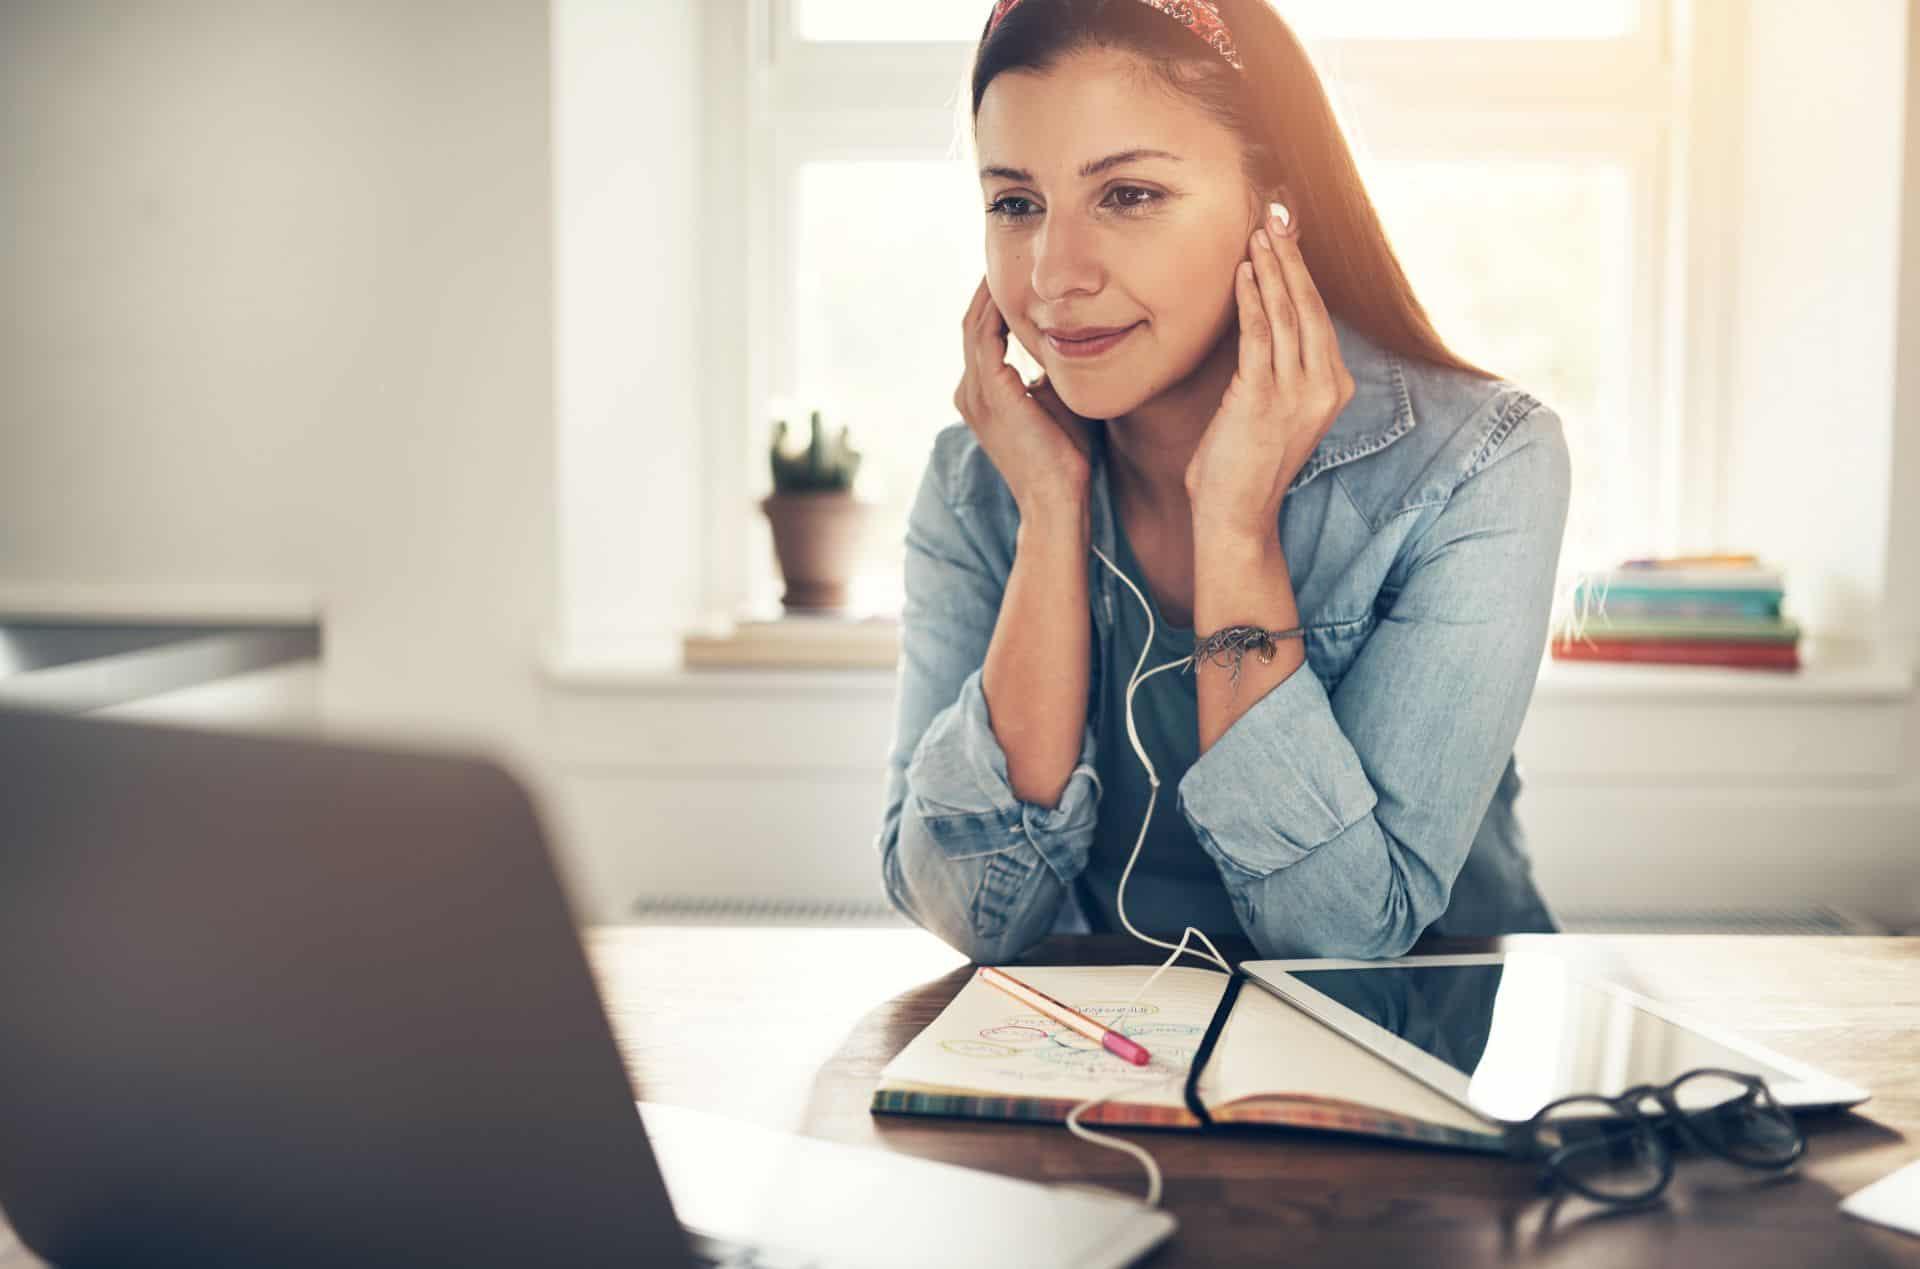 Woman with headphones transcribing